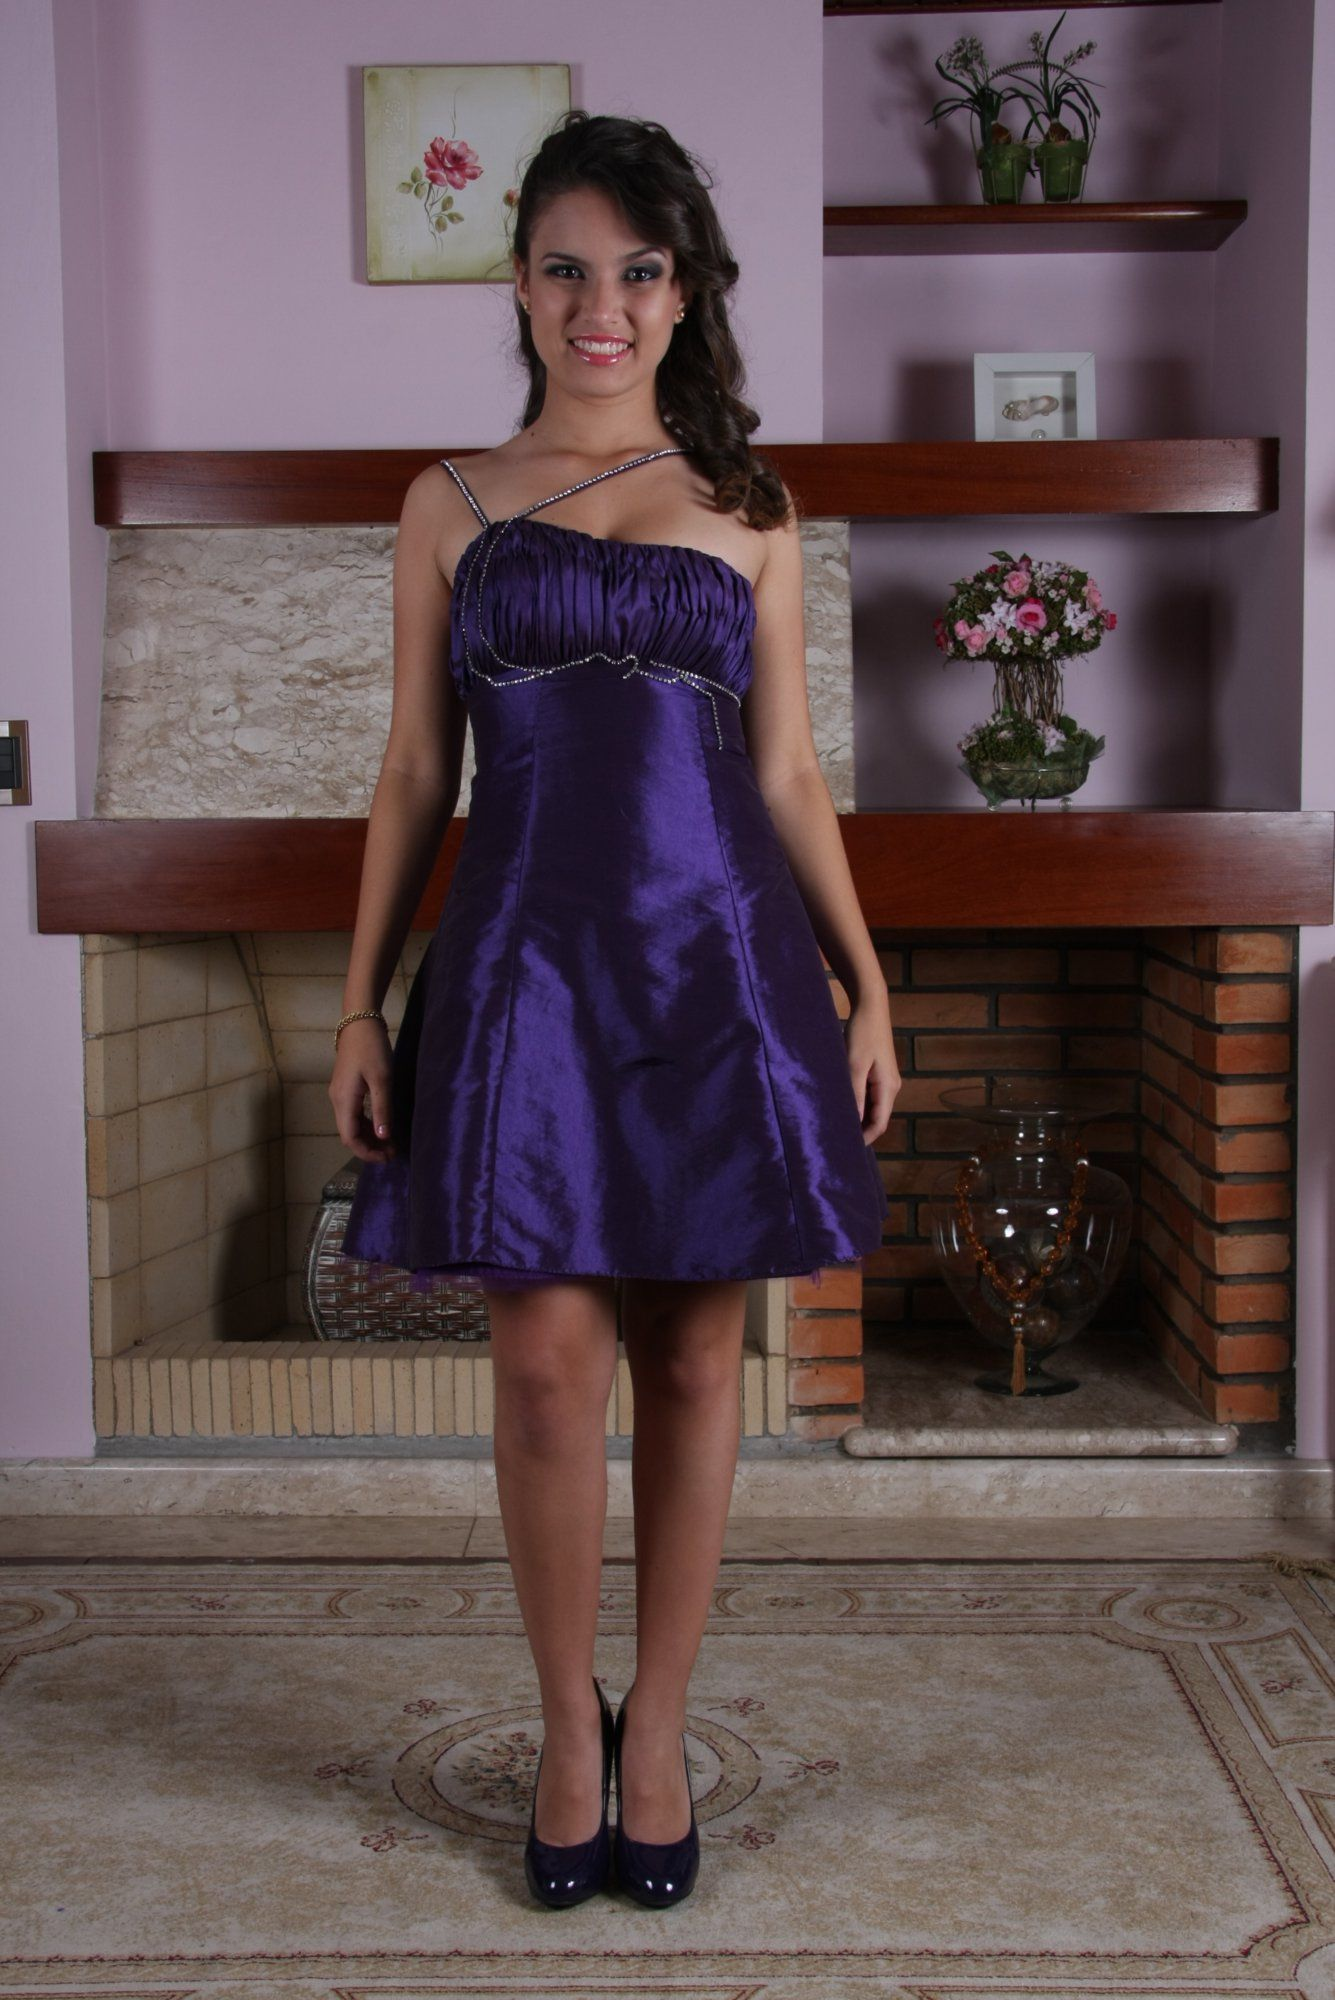 Vestido de Debutante Lilas - 15 - Hipnose Alta Costura e Spa para Noivas e Noivos - Campinas - SP Vestido de Debutante, Vestido de Debutante Lilas, Hipnose Alta Costura